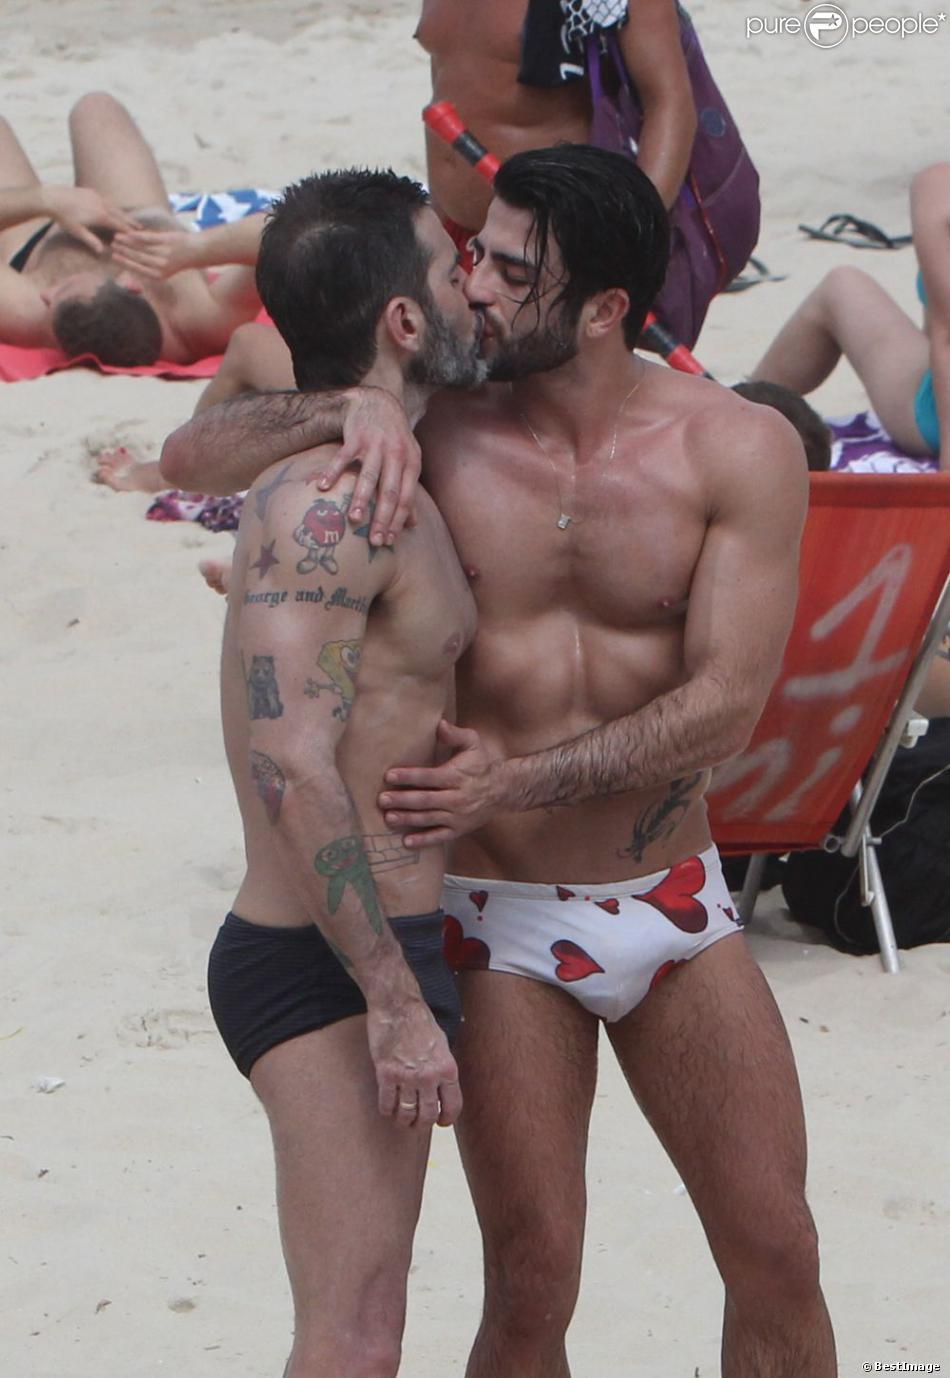 rio nido gay personals Find men seeking men in rio nido online datehookup is a 100% free dating site to meet gay men in rio nido, california.